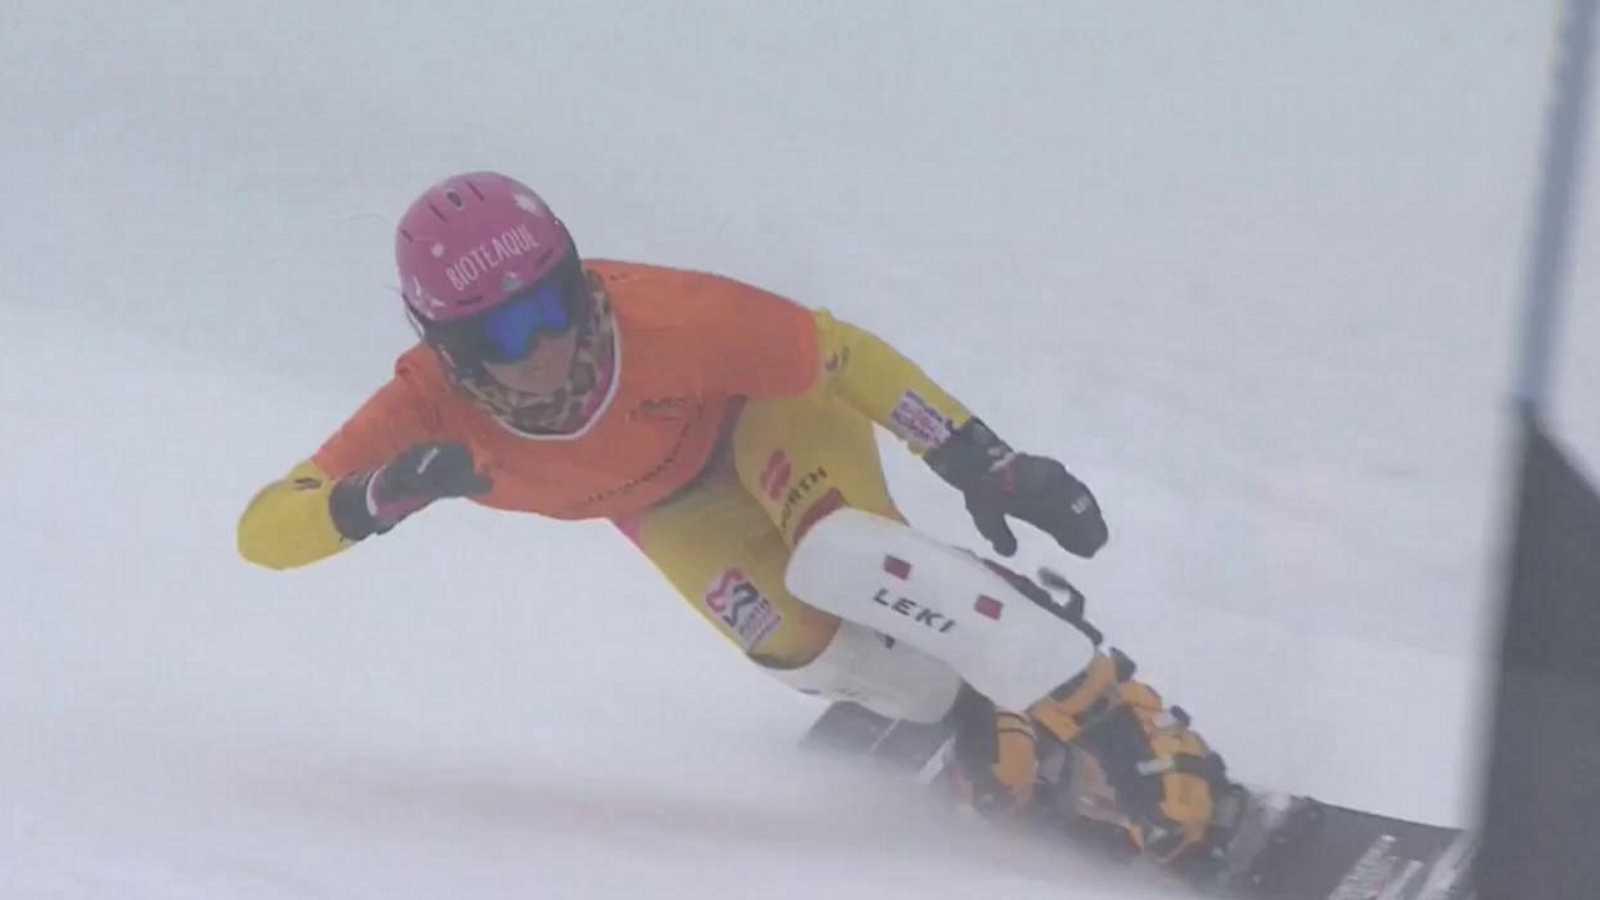 Snowboard - FIS Snowboard Copa del Mundo Magazine - Programa 5 - ver ahora